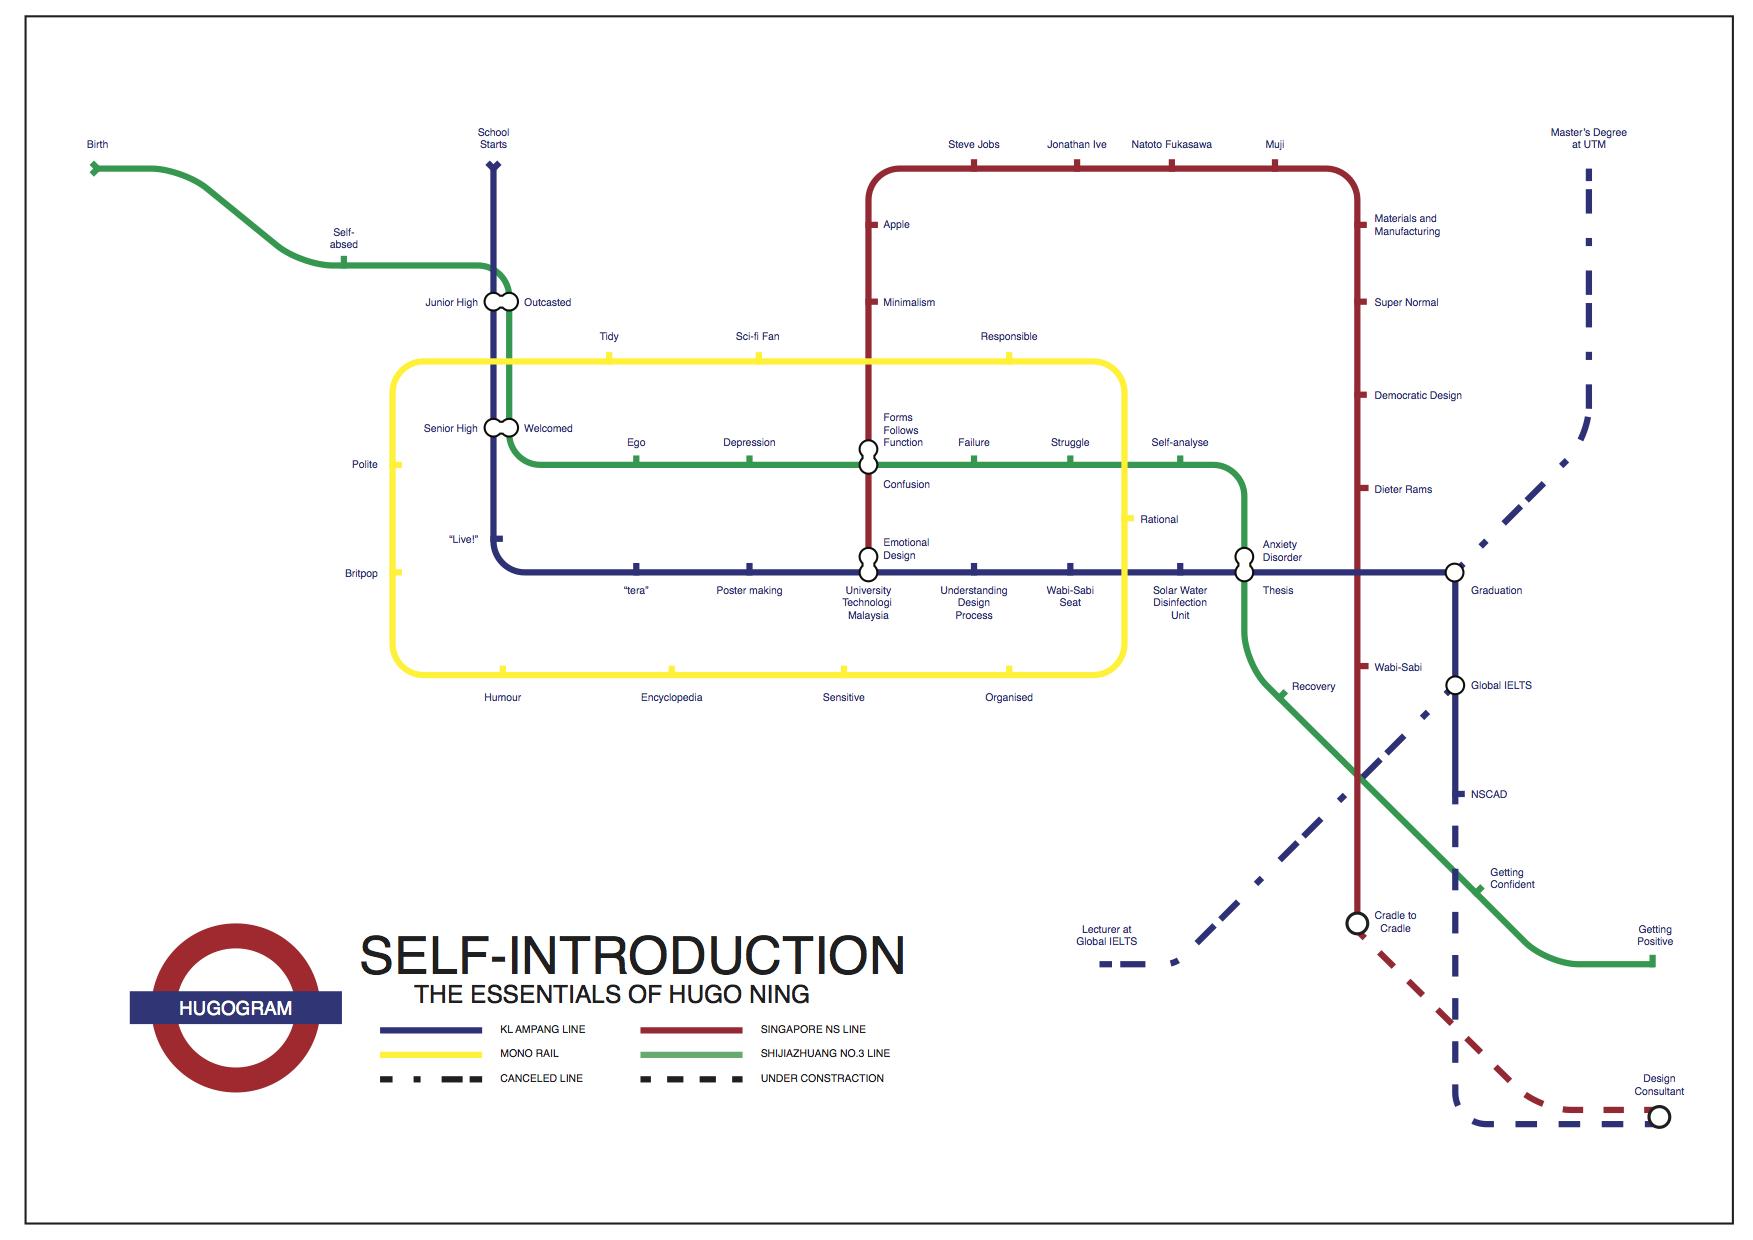 Metro Map GM副本.png